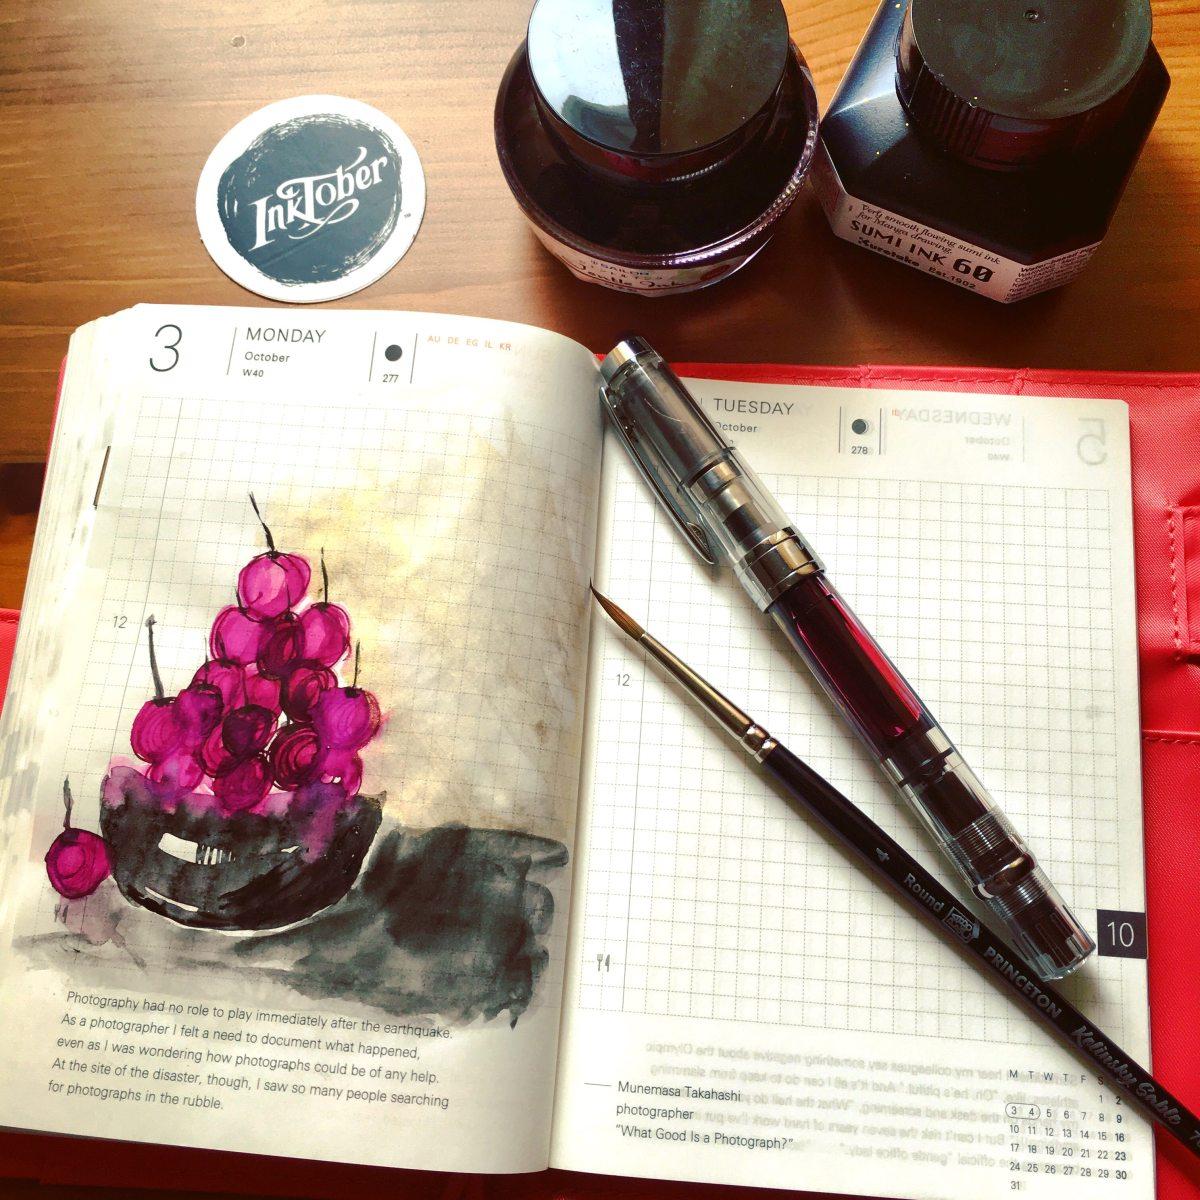 hobonichi techo fountain pen ink sketch of cherries by jessica seacrest, sailor Jentle oku-yama, zig sumi ink, gold, inktober, twsbi diamond 580 fountain pen